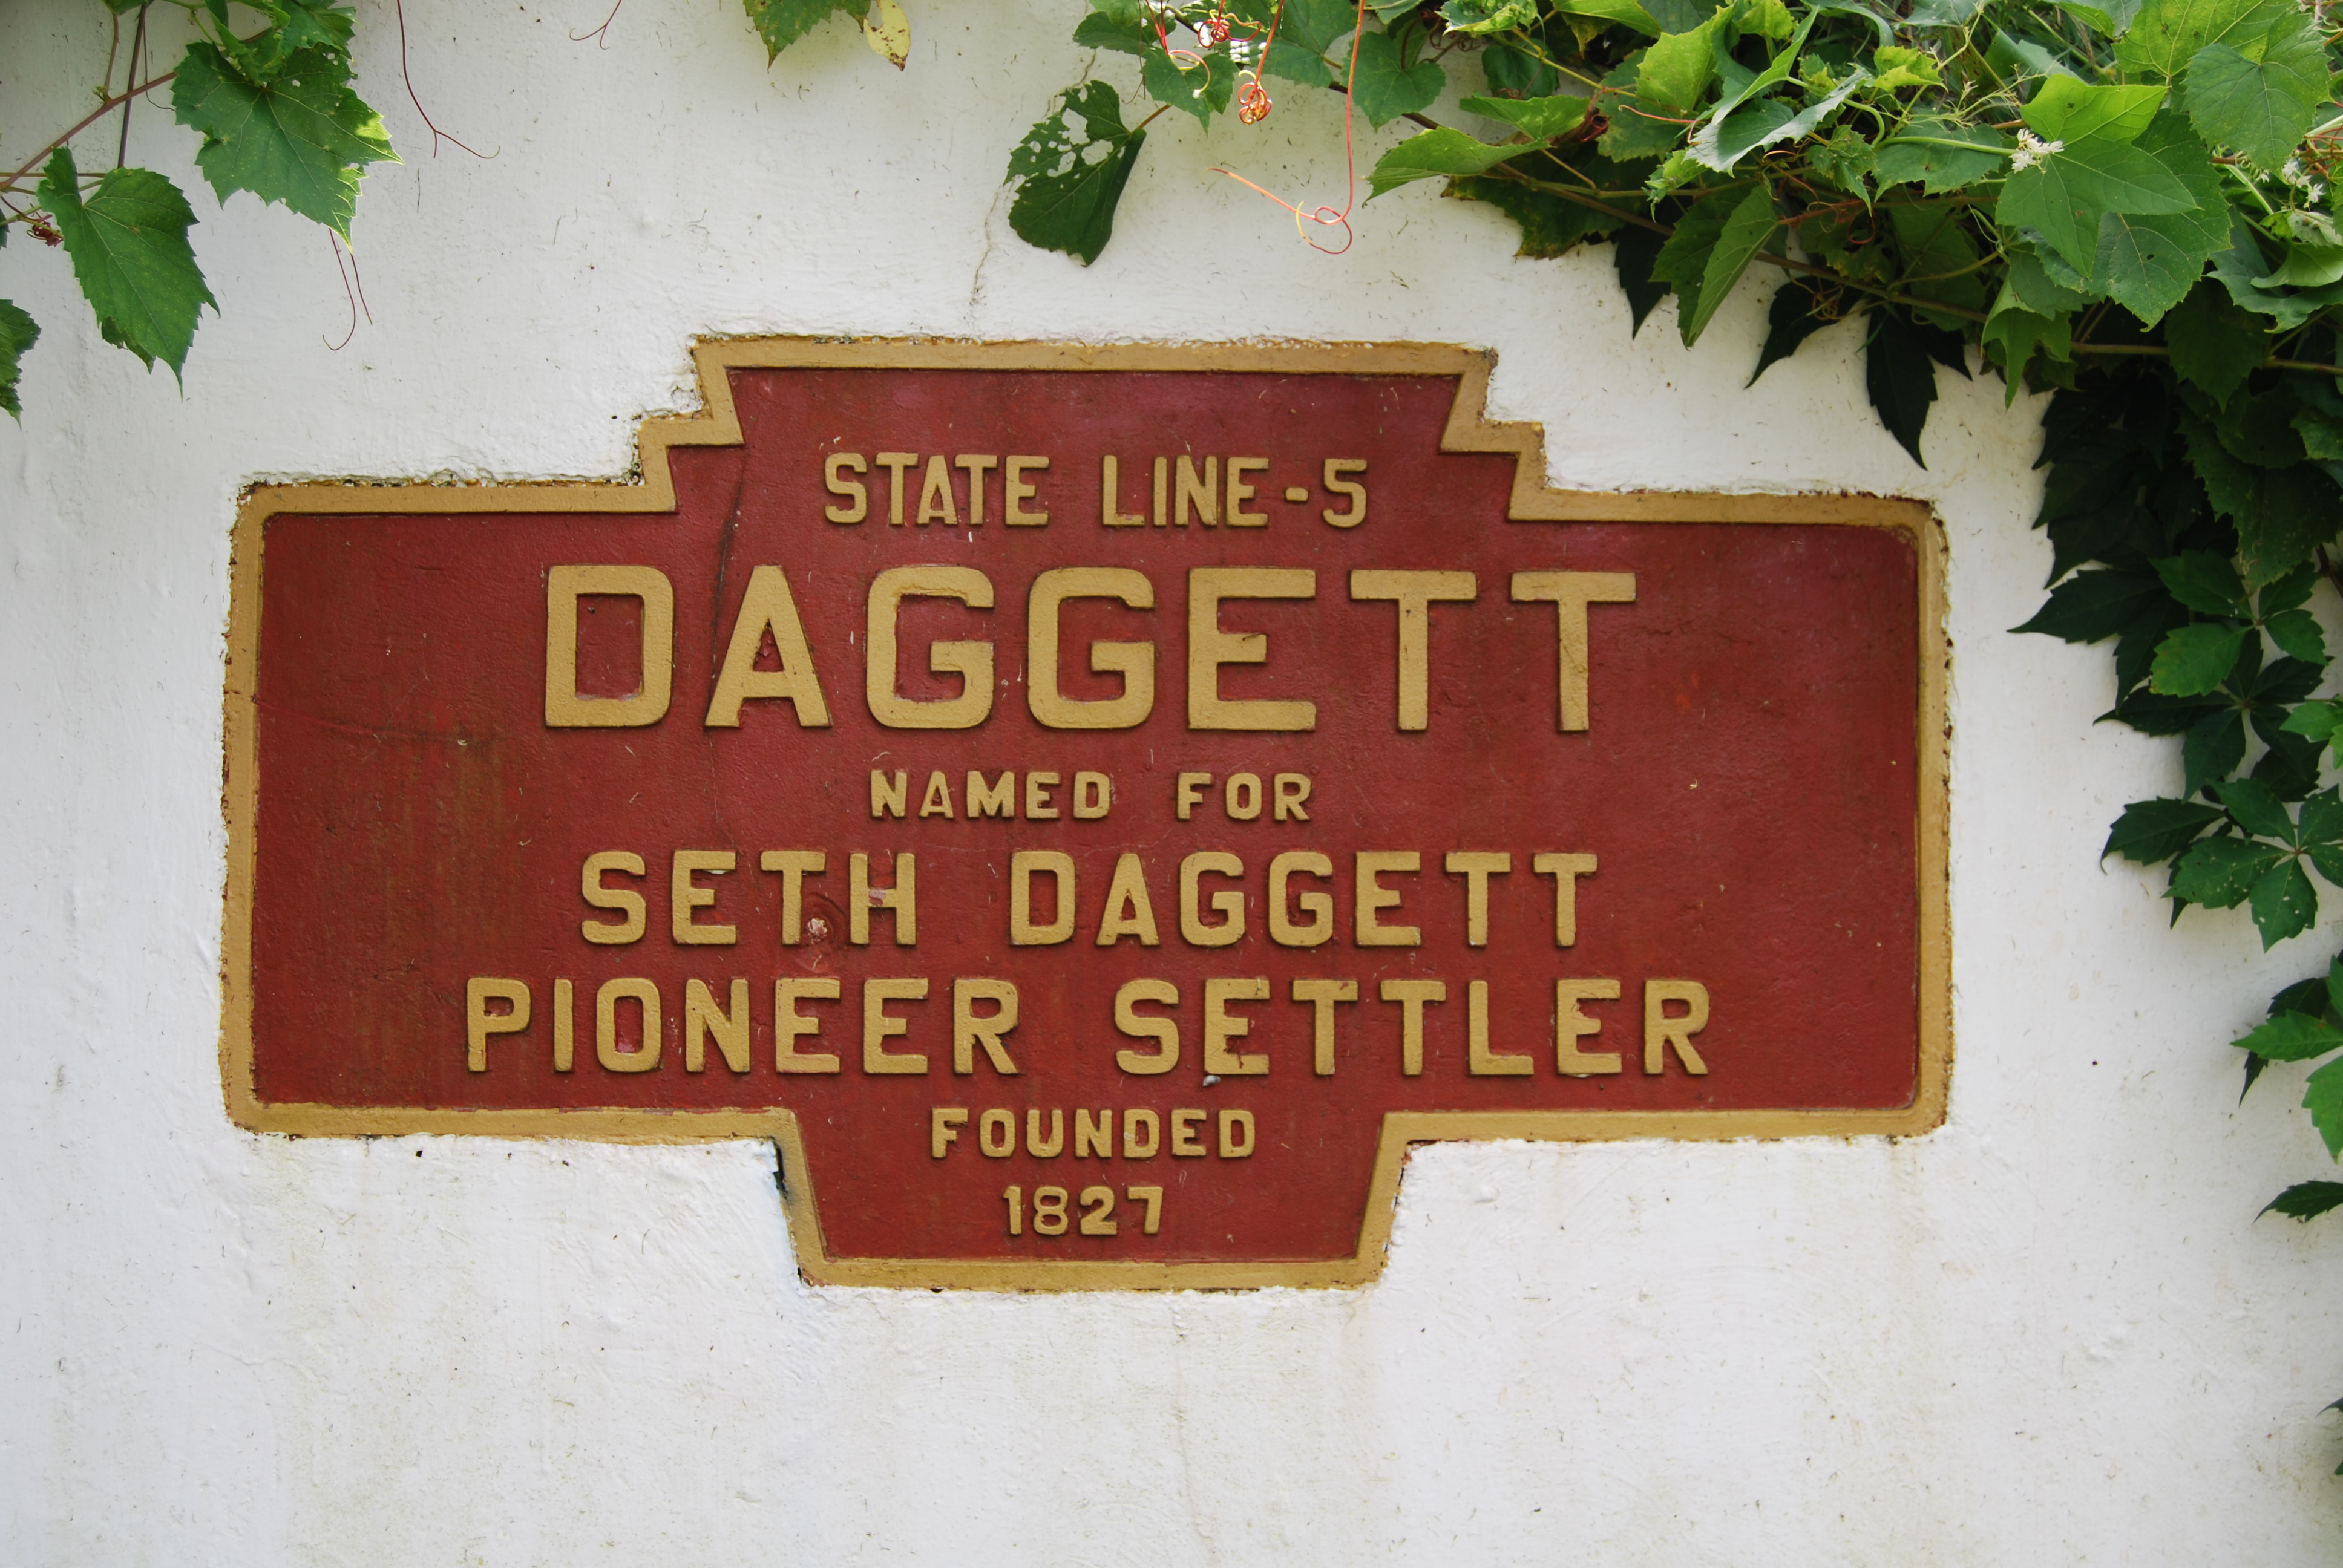 town-daggett-stateline-0818mwintermantel-1